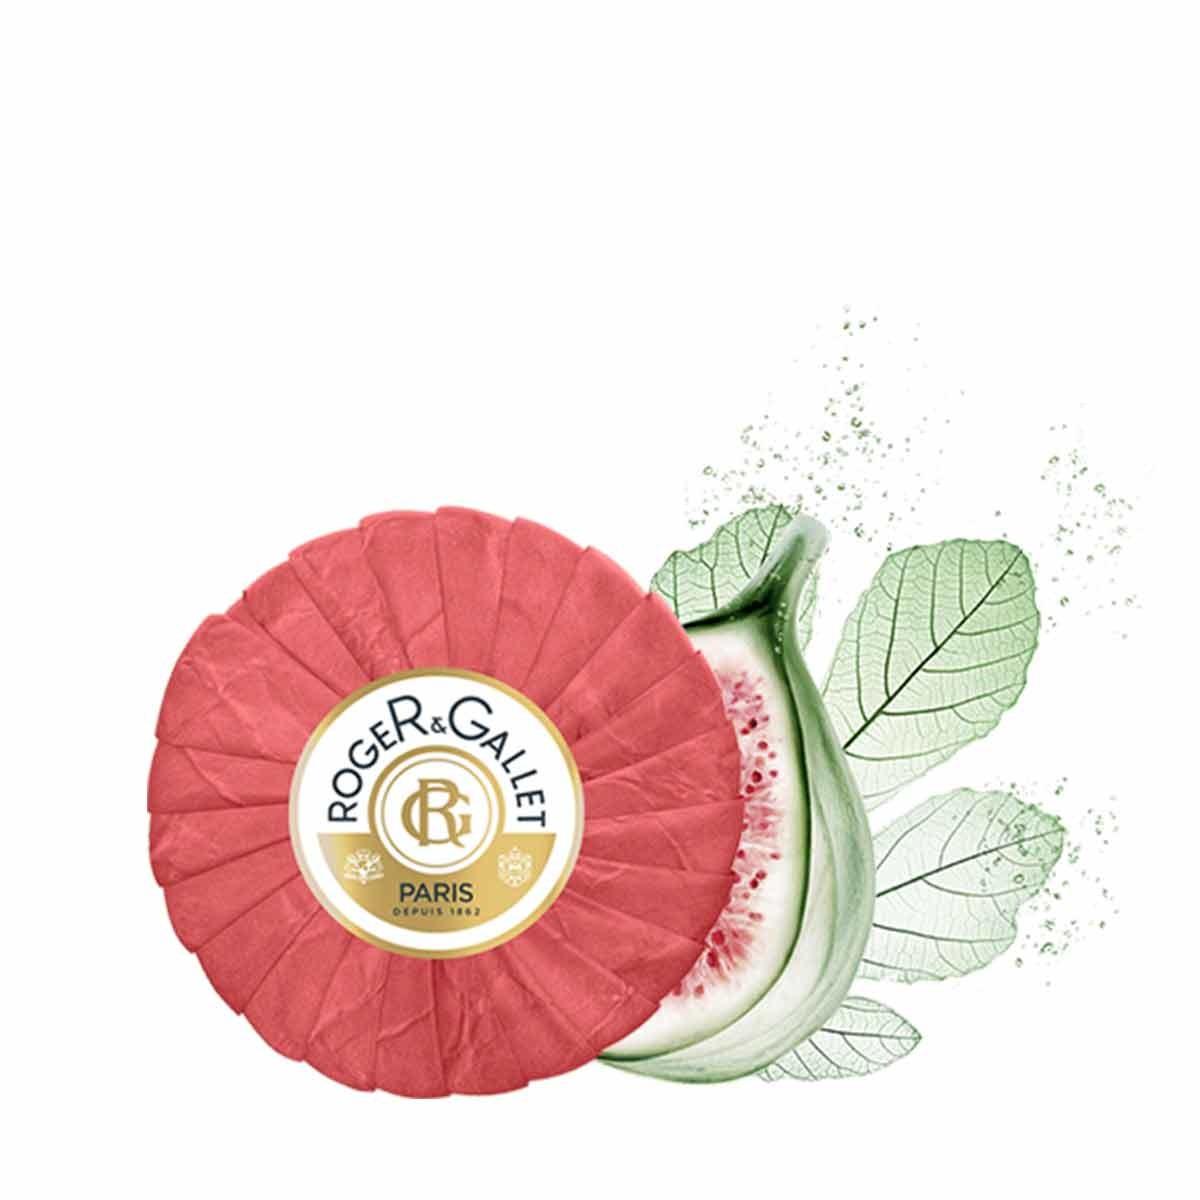 Roger & Gallet Fleur De Figuier Perfumed Soap 100G